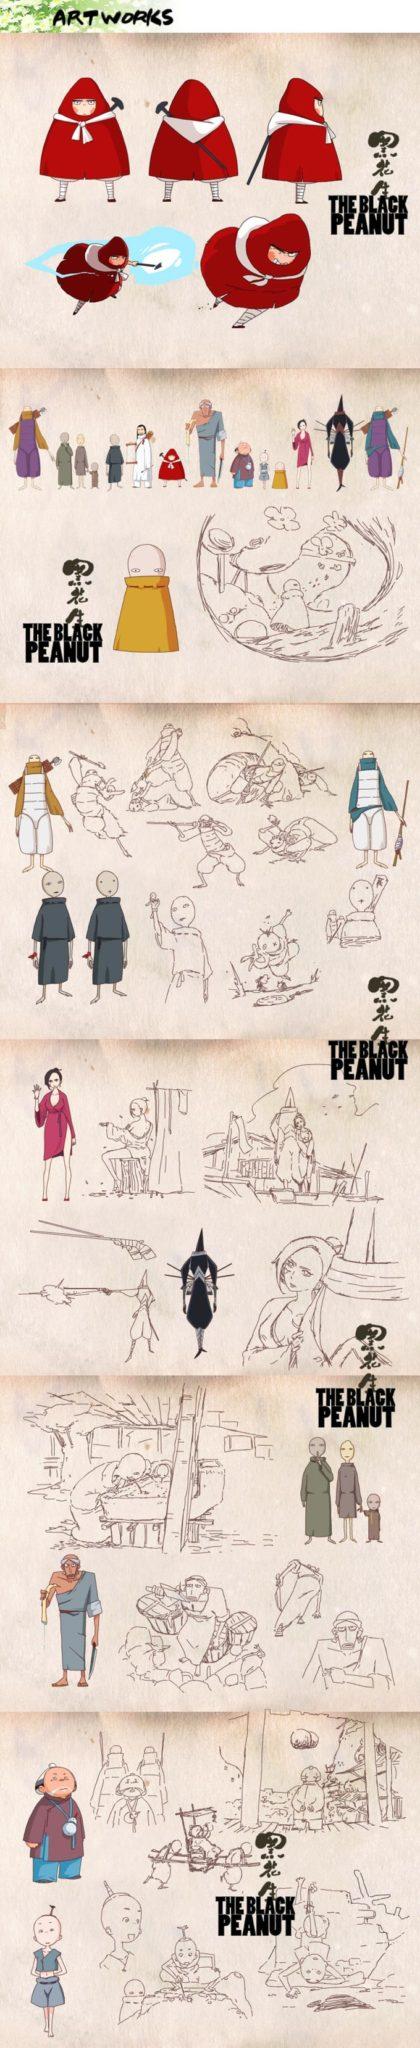 The Black Peanut Chinese animation - artworks